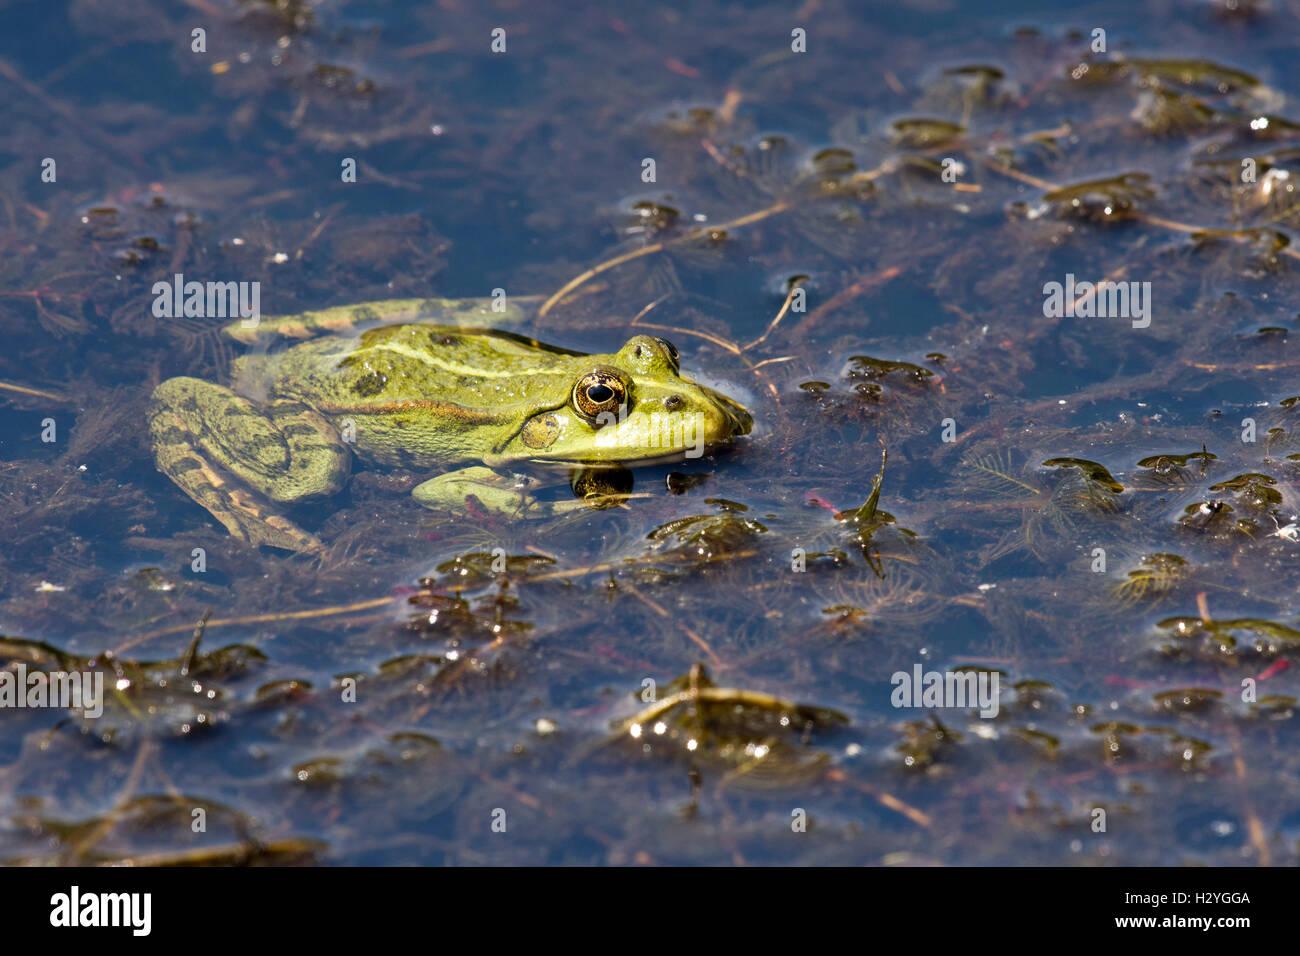 The edible frog (Rana esculenta), water plants, Burgenland, Austria - Stock Image